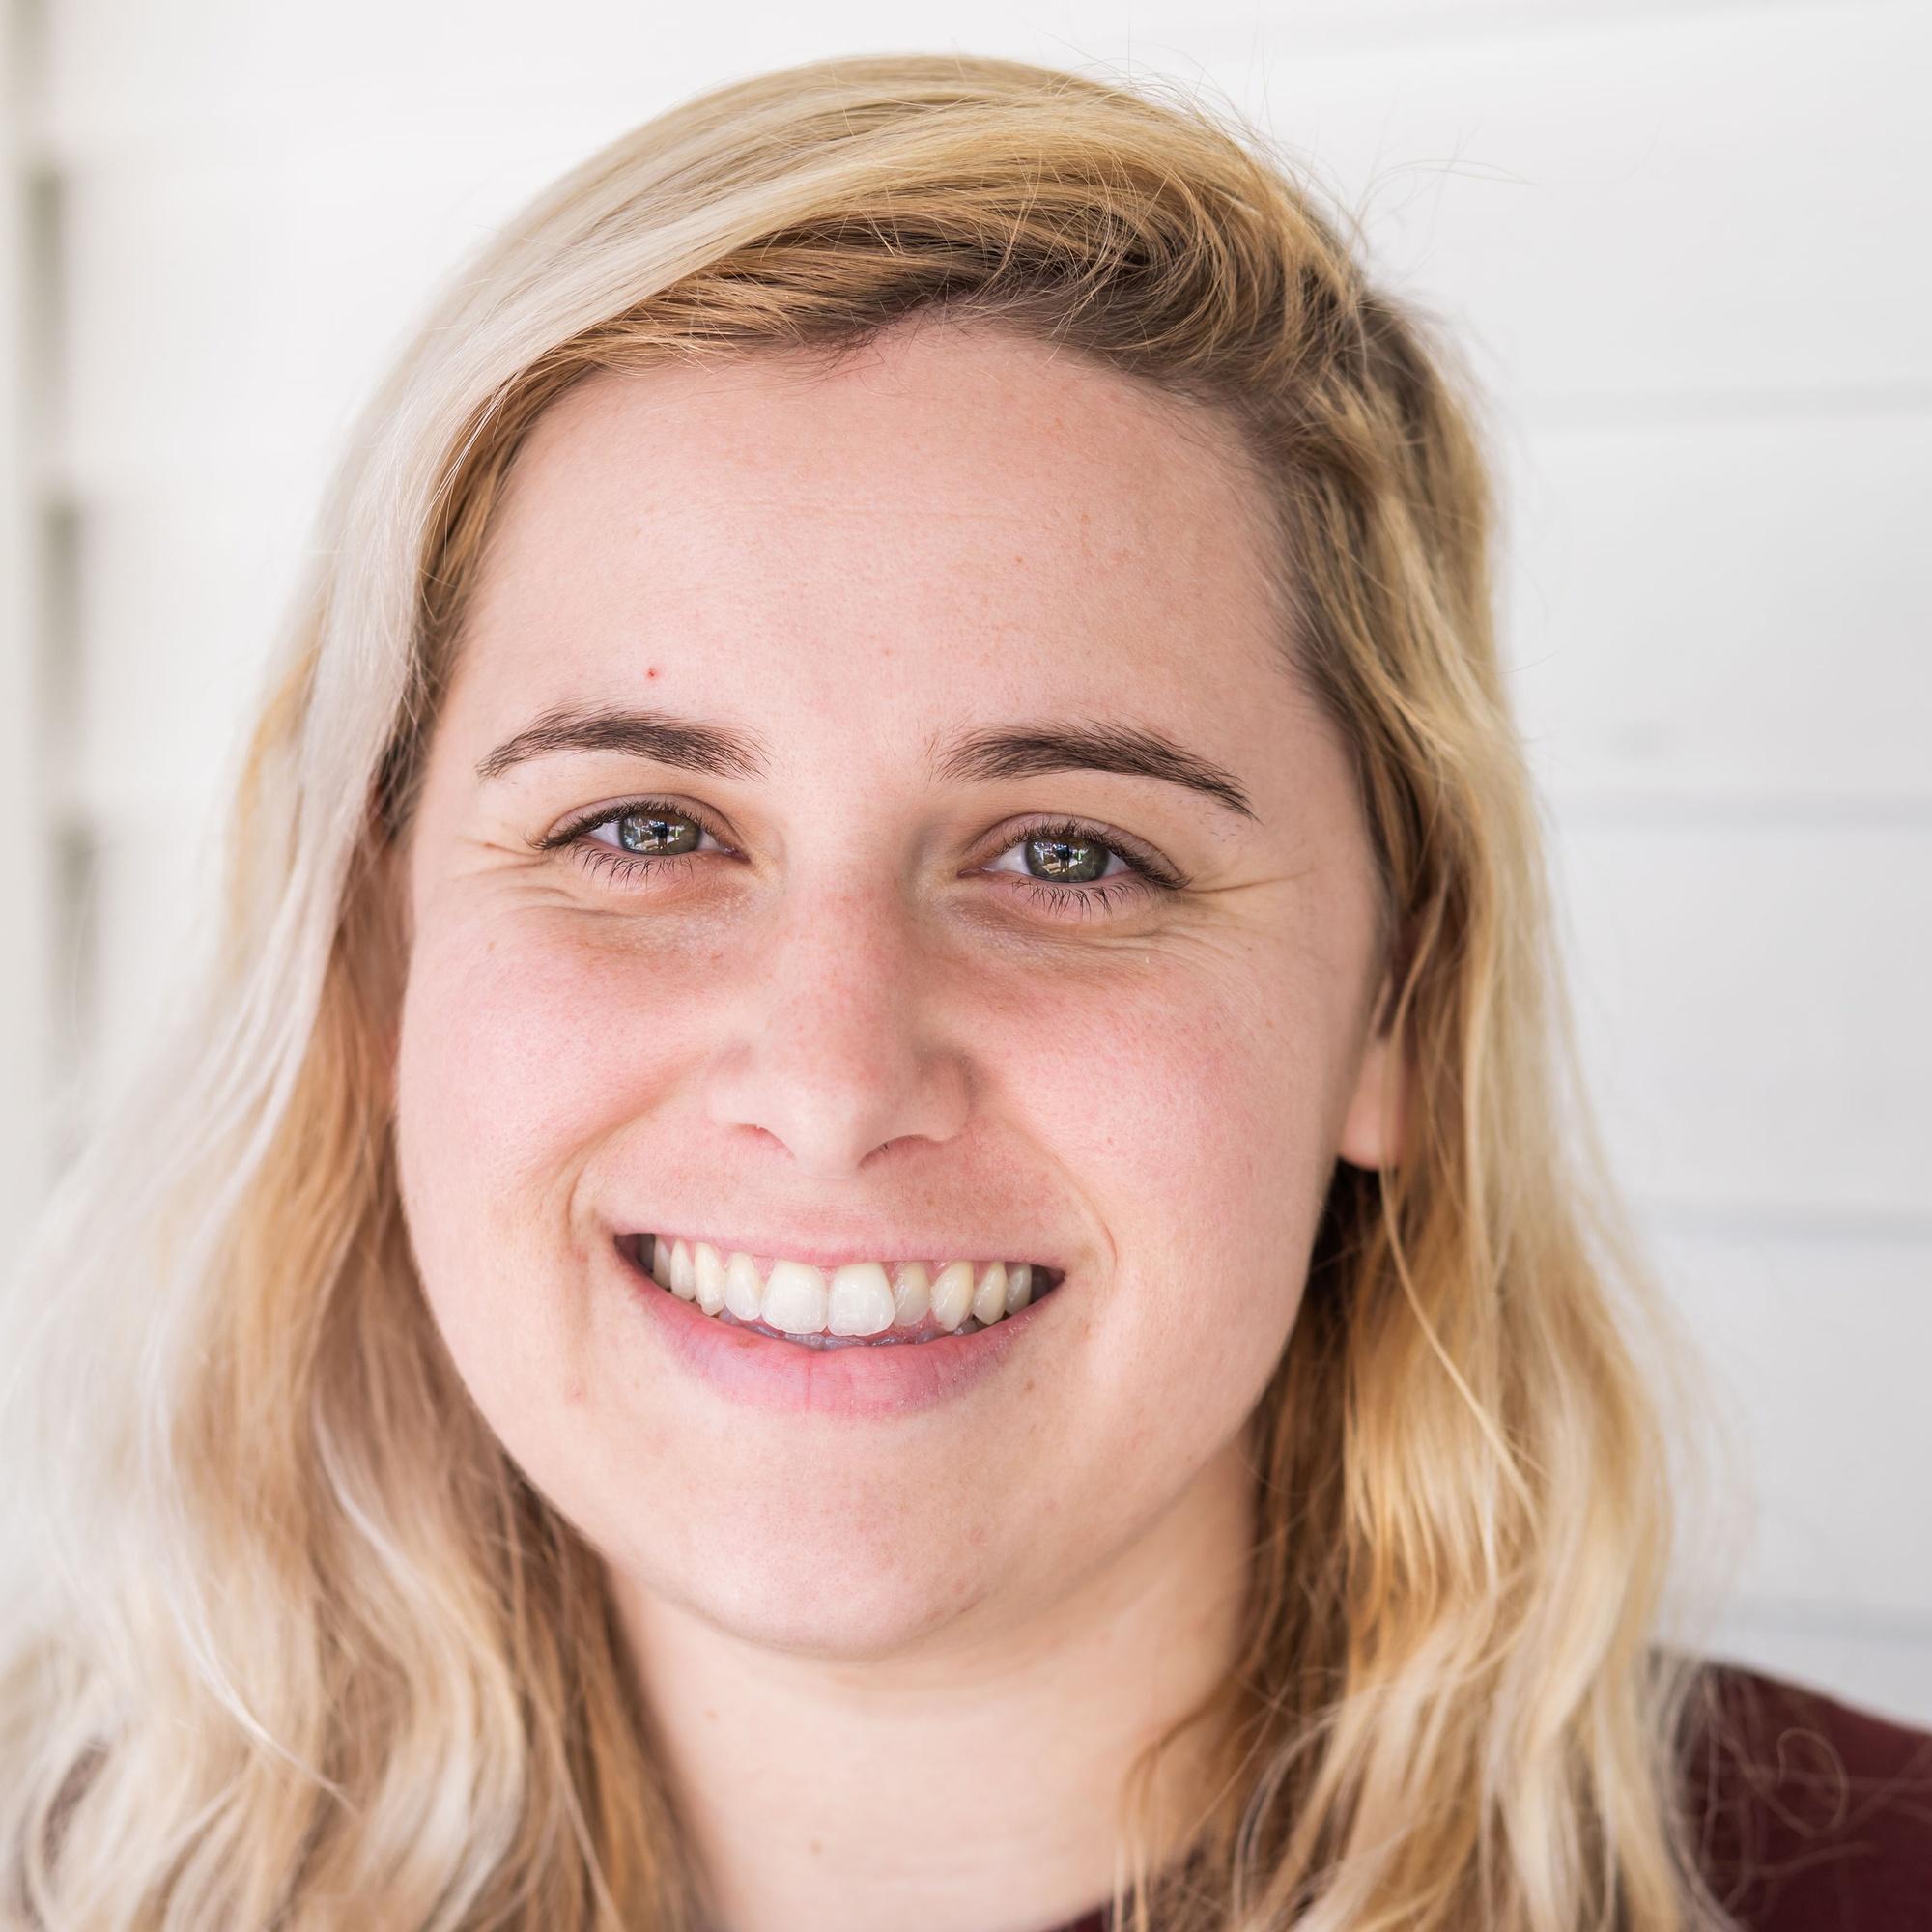 Profile photo of Marissa Reynolds, Senior Customer Support Representative at Anagram